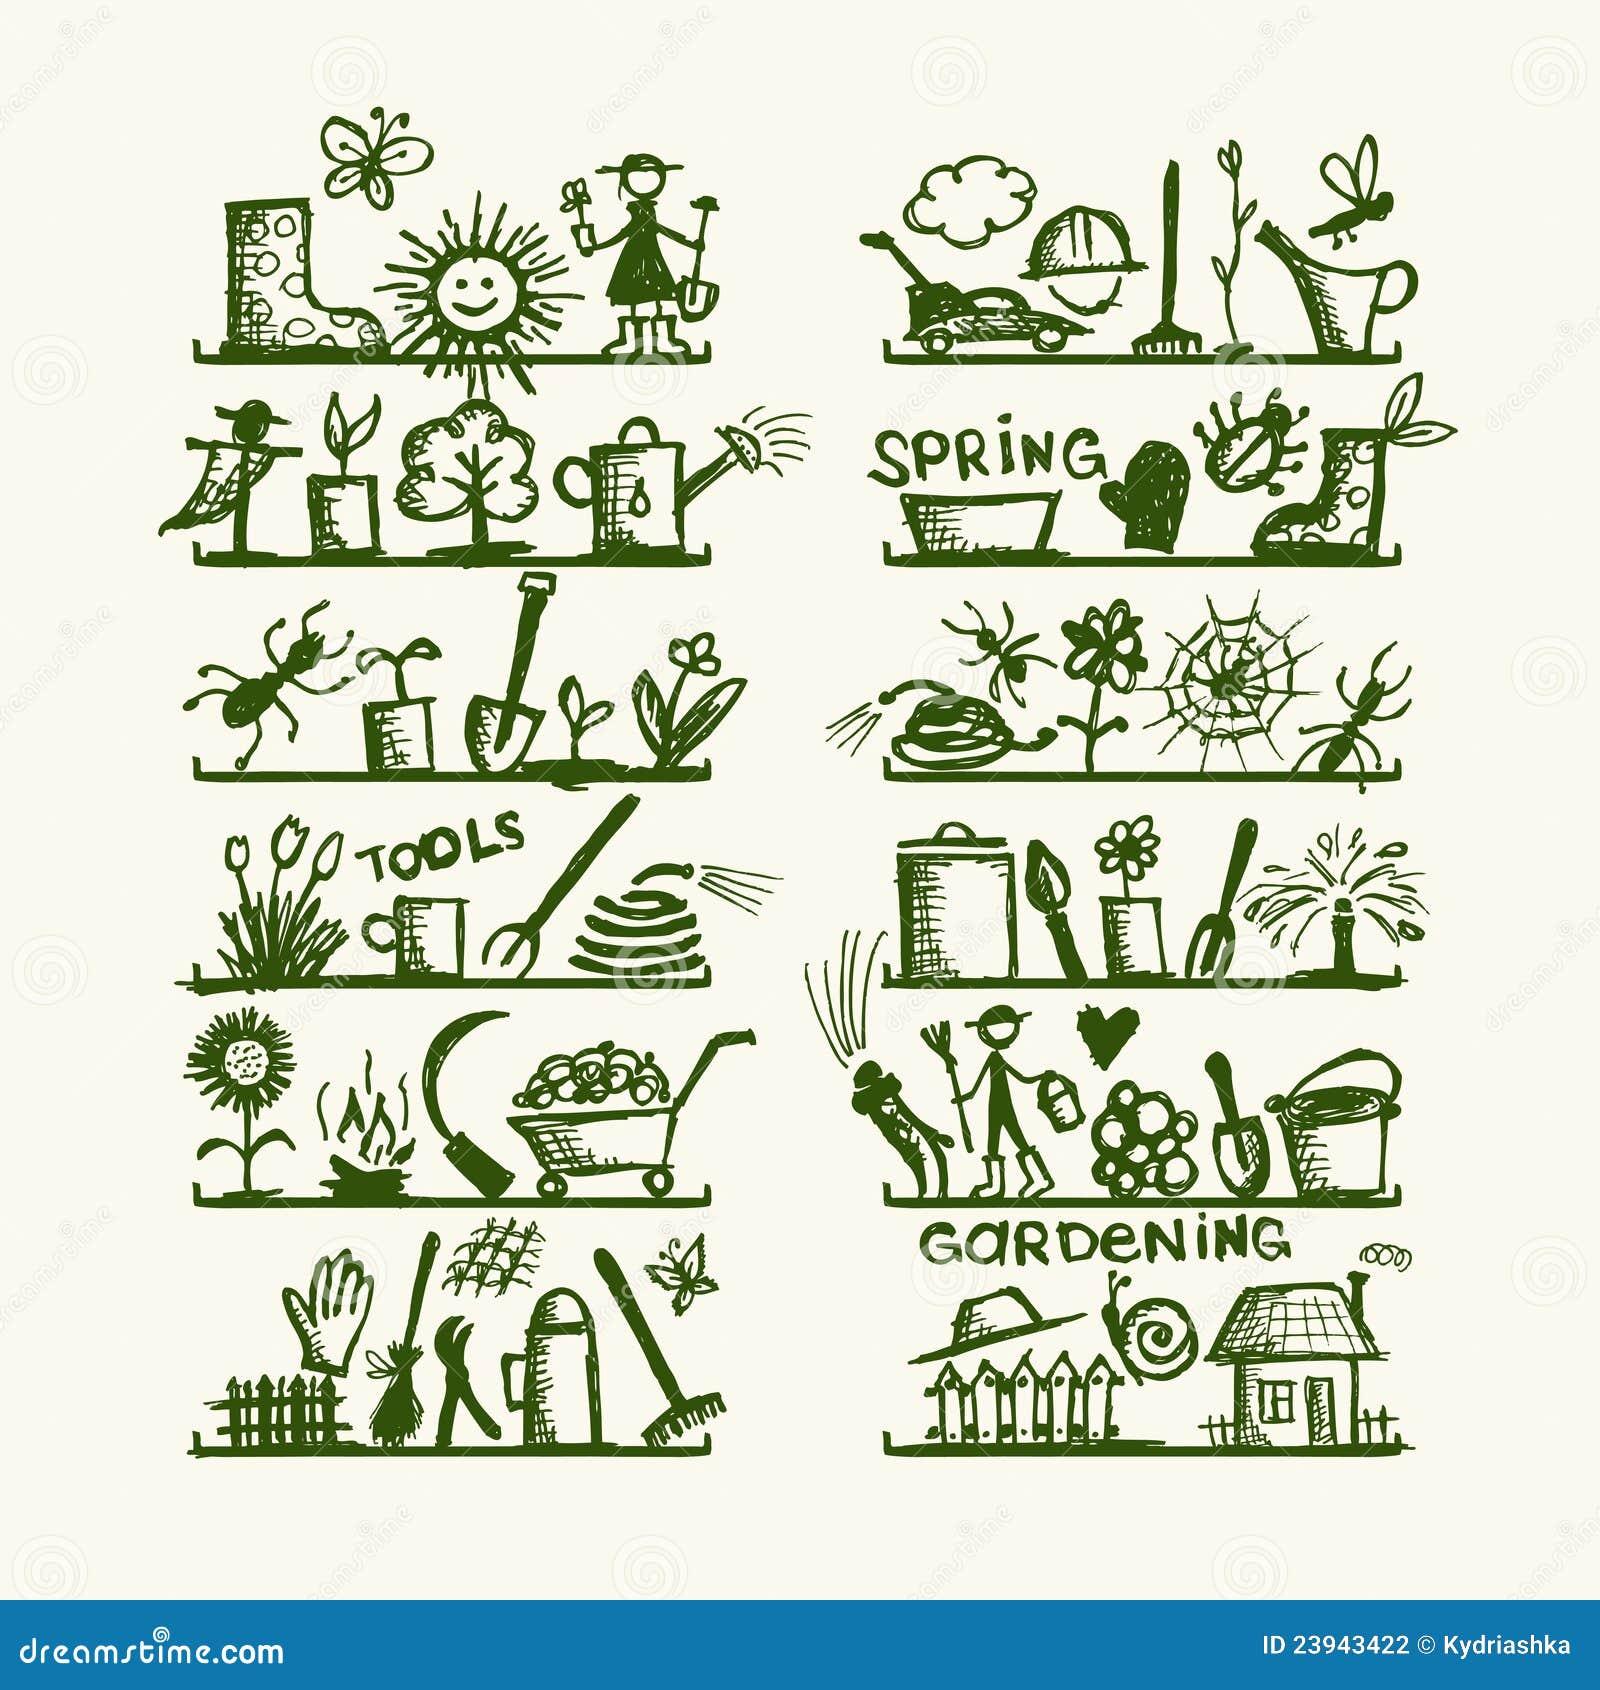 Garden Stock Image Image Of Design: Garden Tools On Shelves, Sketch For Your Design Stock